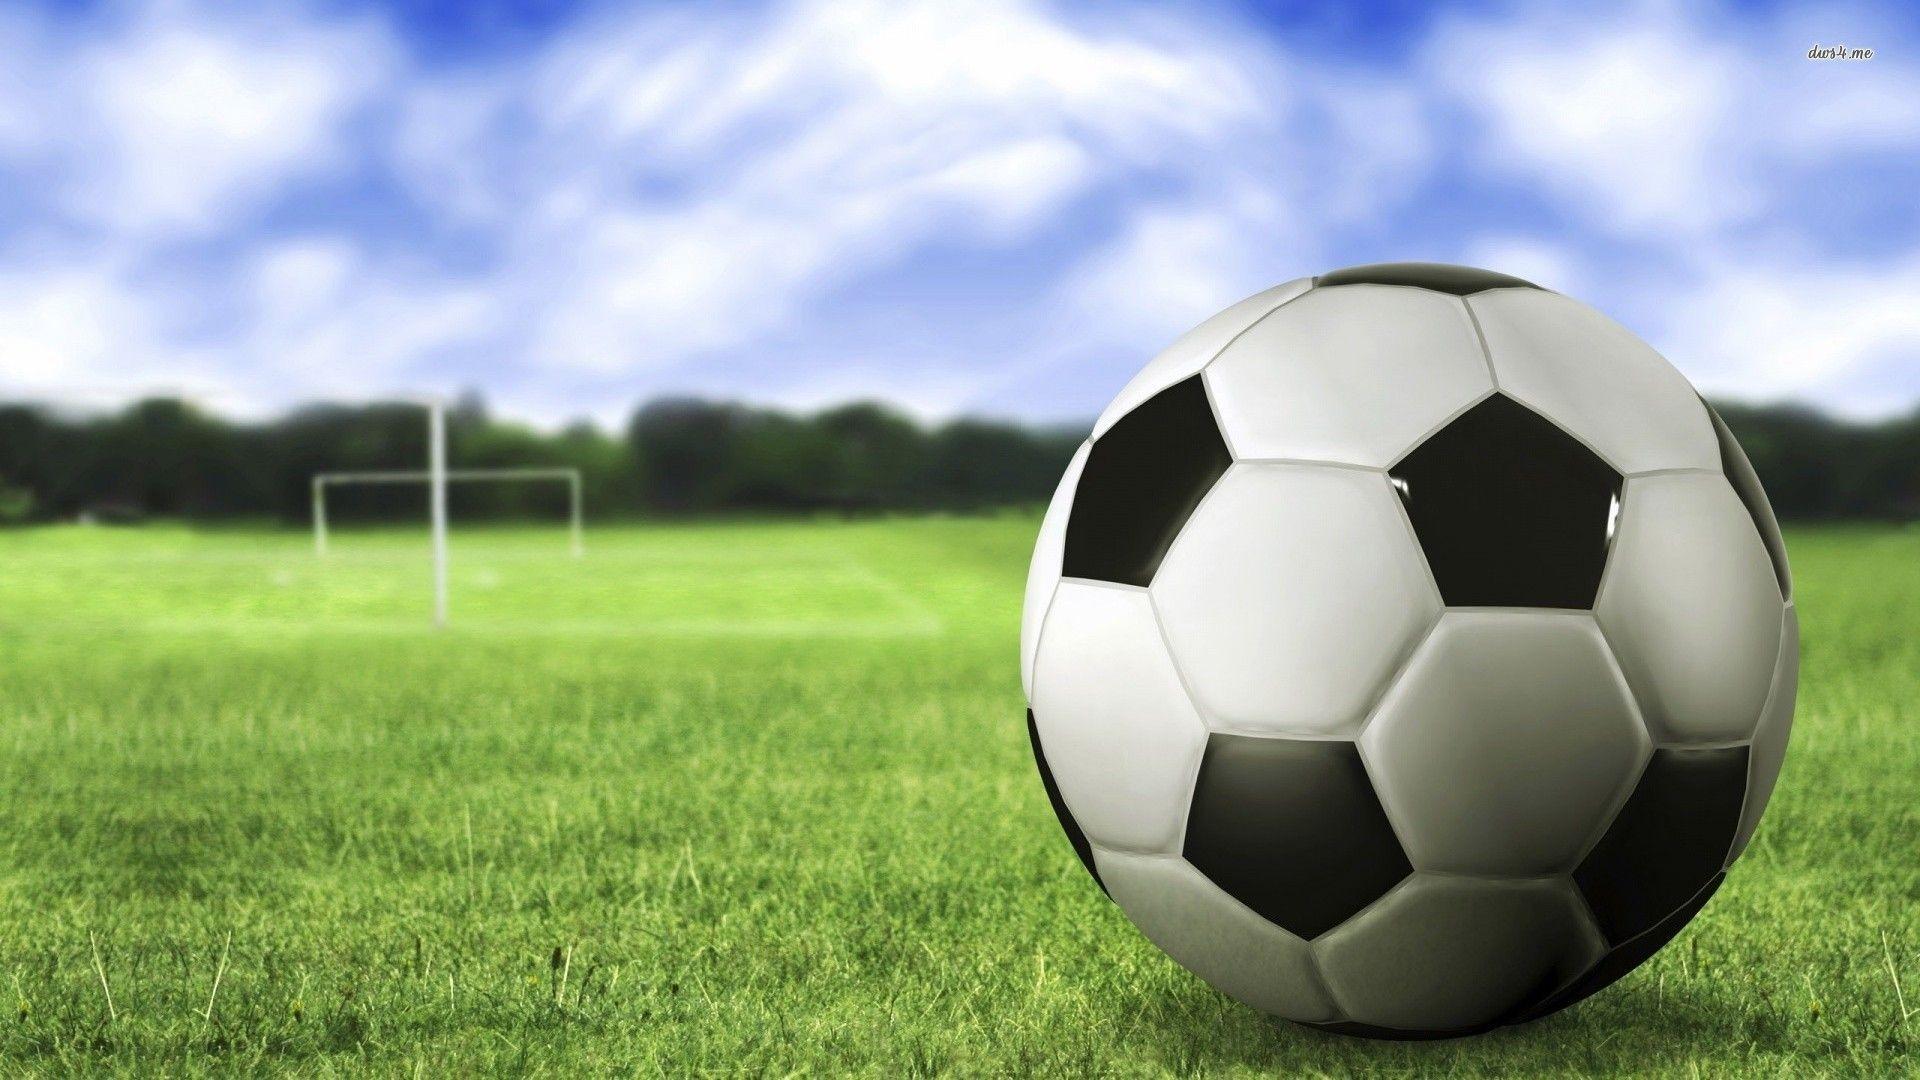 Soccer Wallpaper Images